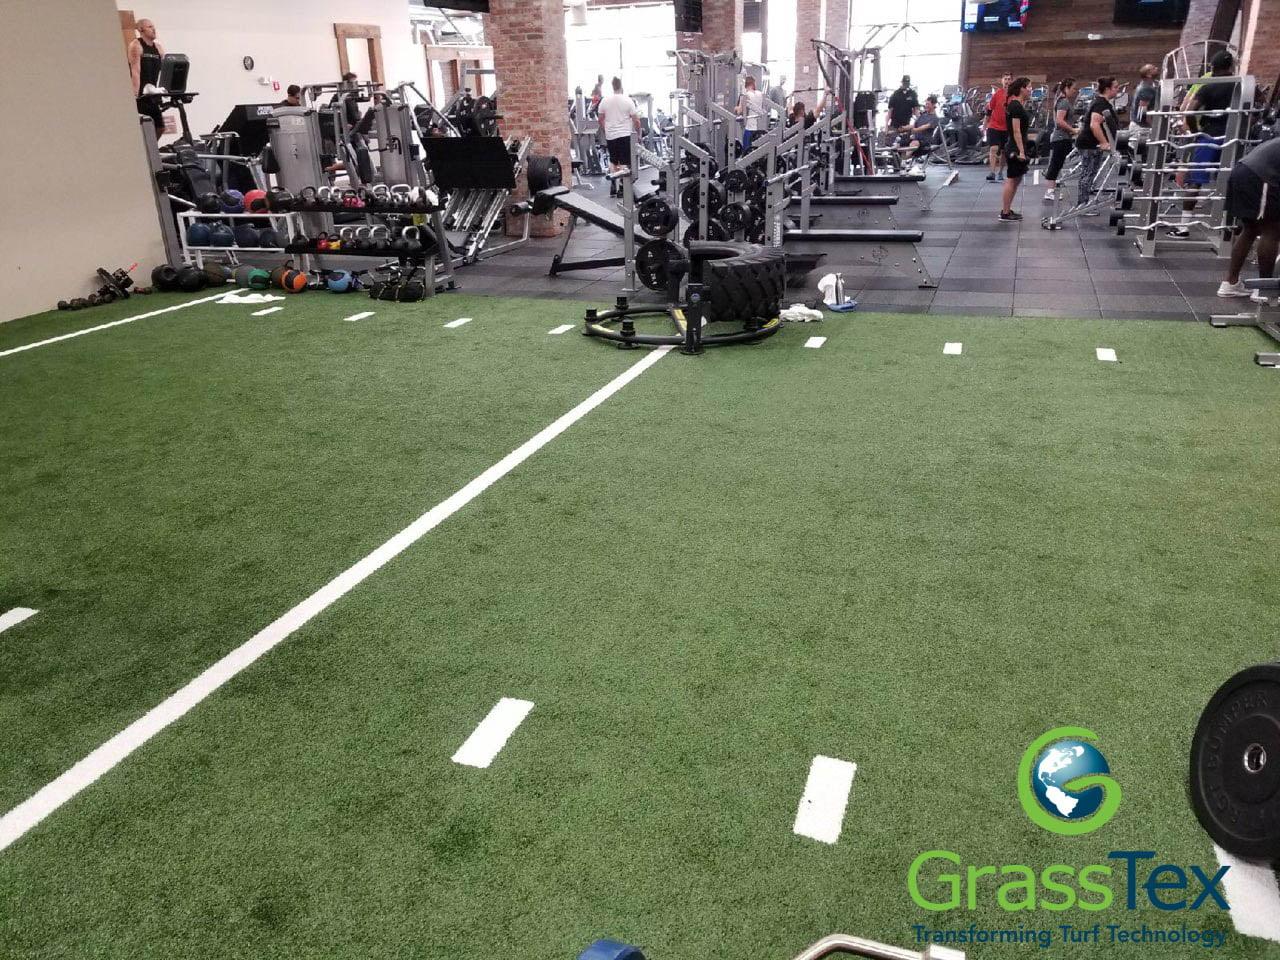 GrassTex Featured Install Arena Pro   GrassTex